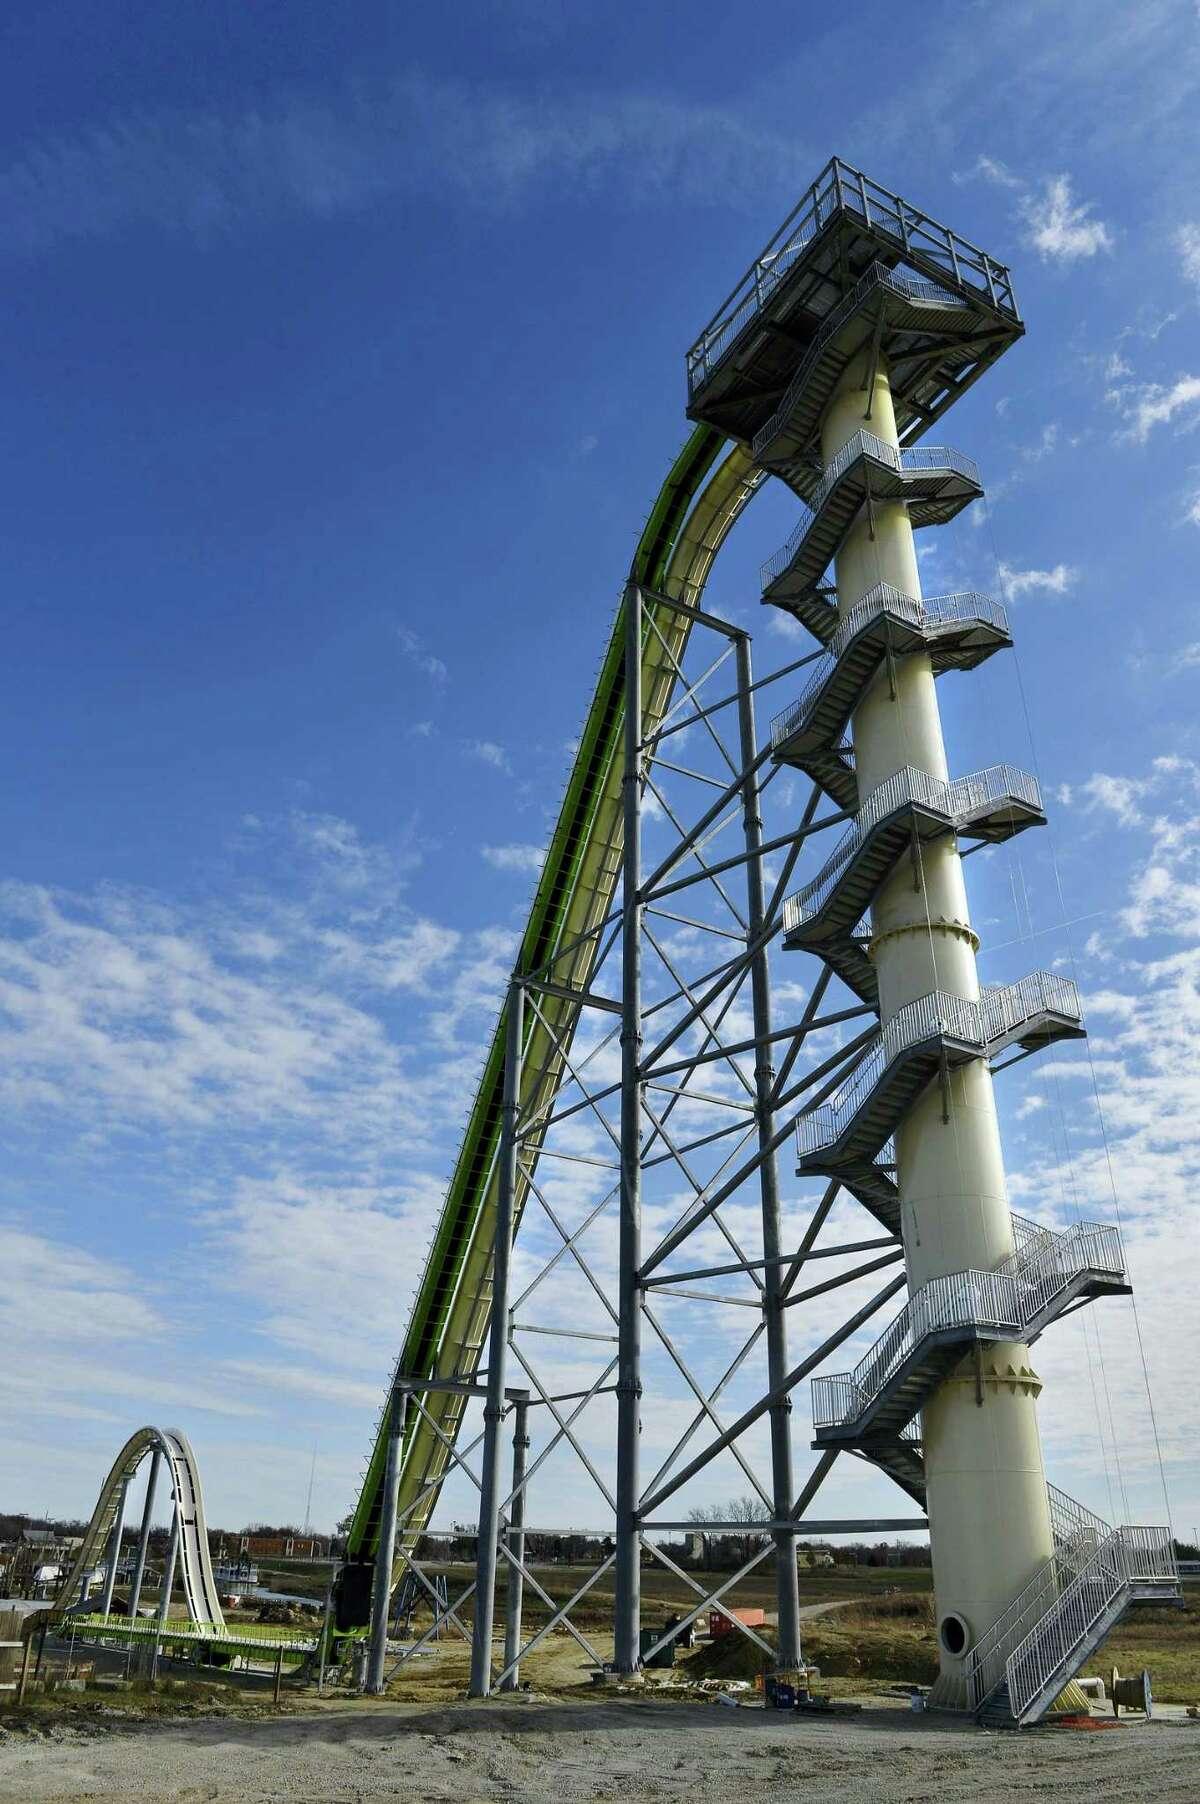 This Nov. 2013 photo shows Schlitterbahn's new Verruckt speed slide/water coaster in Kansas City, Kan.